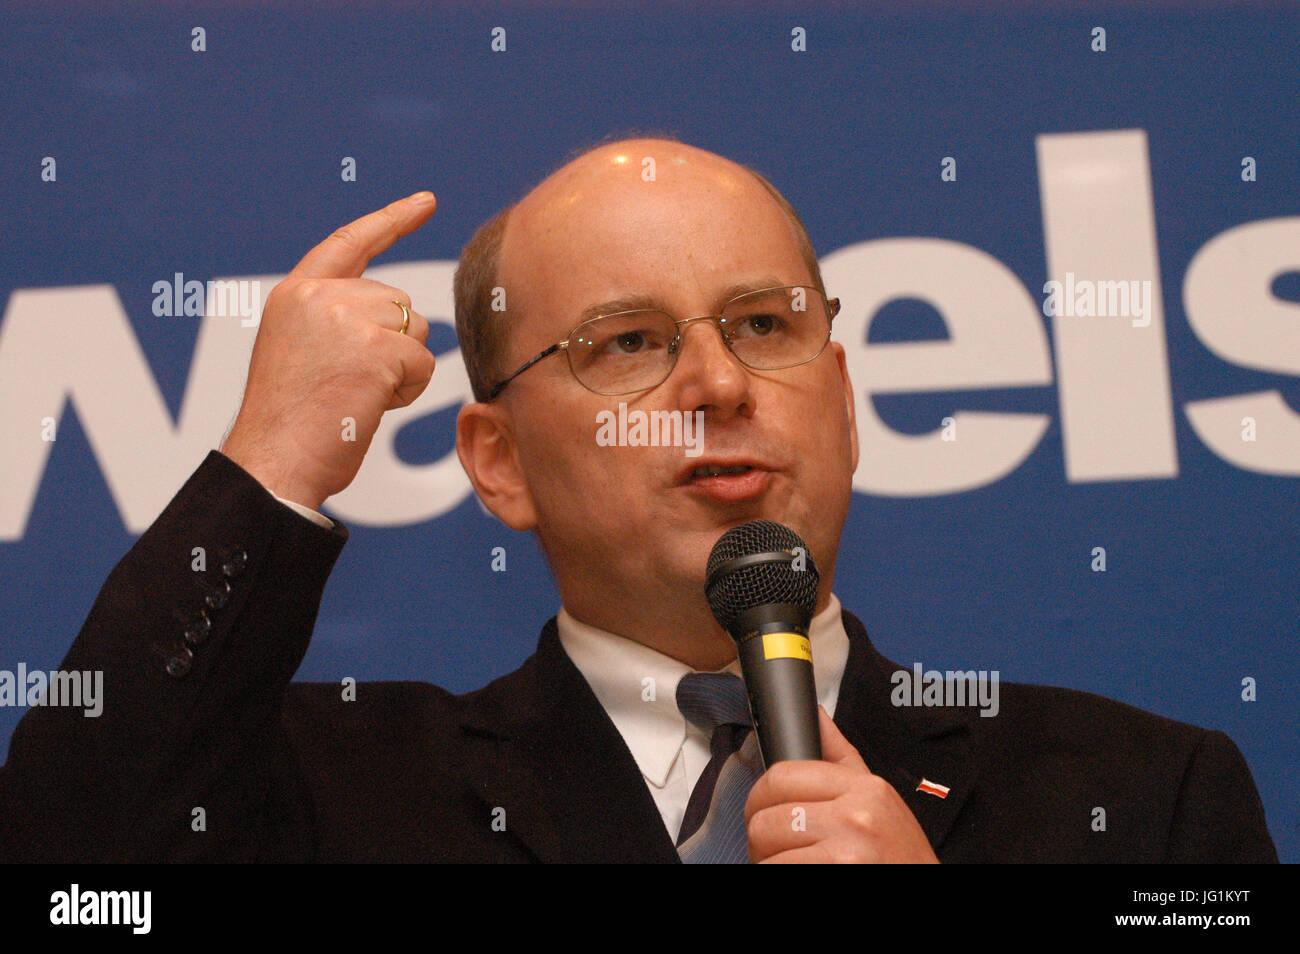 Jan Władysław Rokita (born June 18, 1959 in Cracow) Polish politician and publicist, 1992-1993 minister, deputy - Stock Image